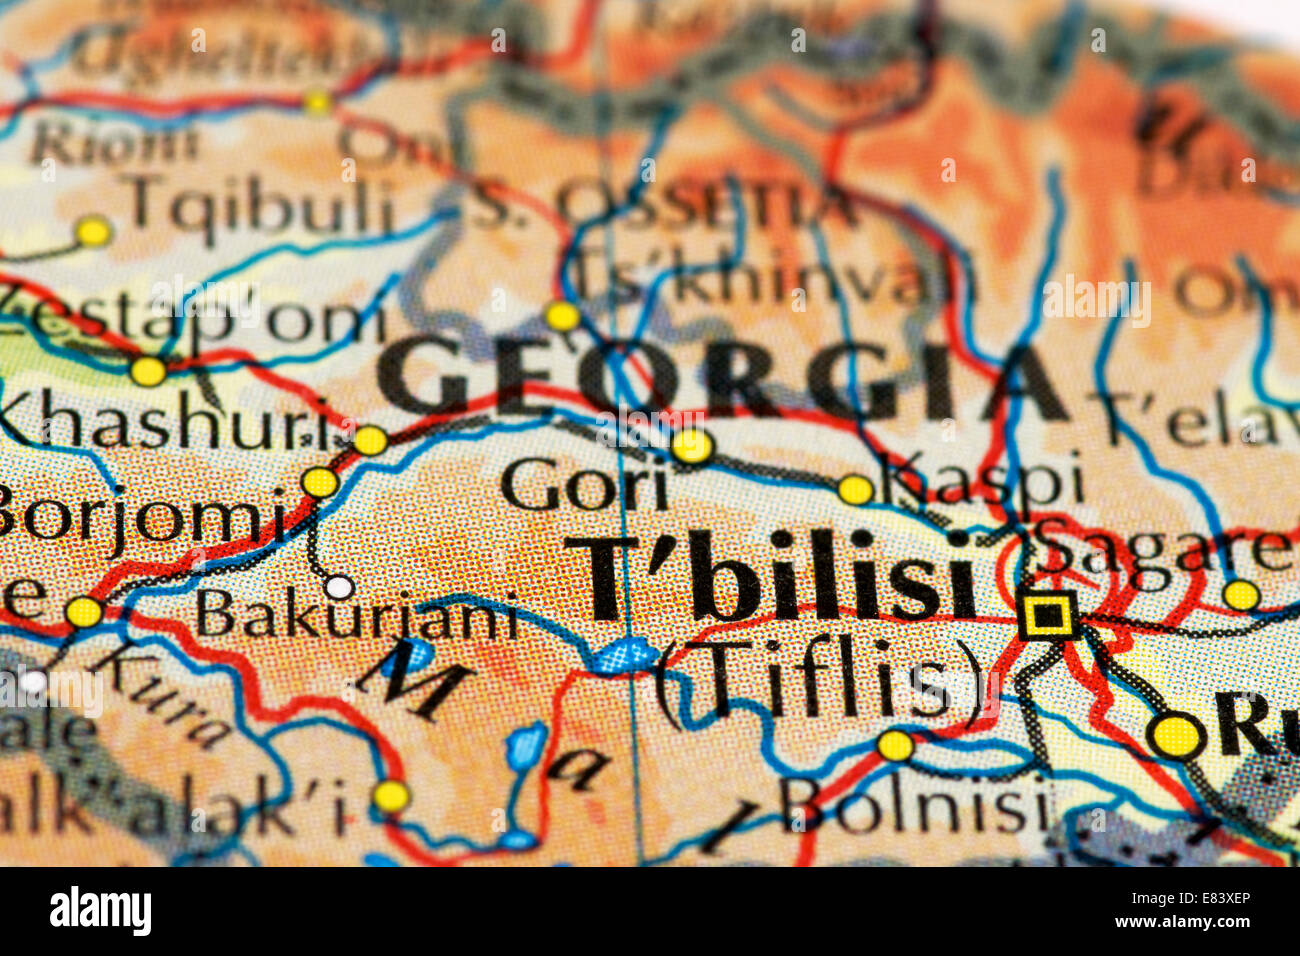 Close up of map of T'bilisi, Georgia - Stock Image